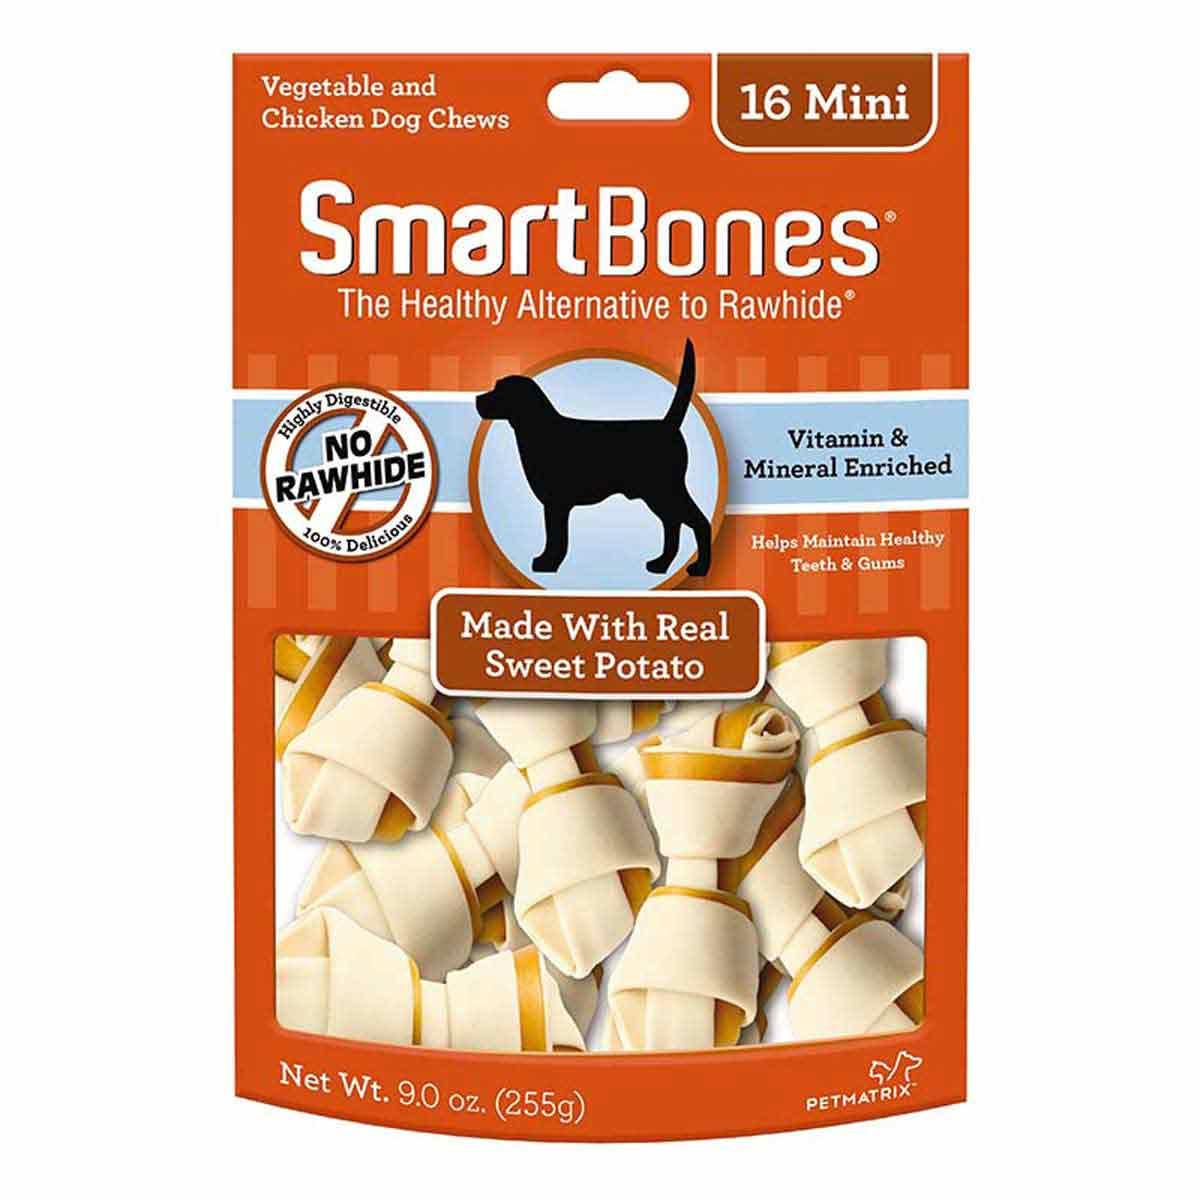 Mini SmartBones Sweet Potato 16 Pack Rawhide Alternative Dog Chews at Ryan's Pet Supplies